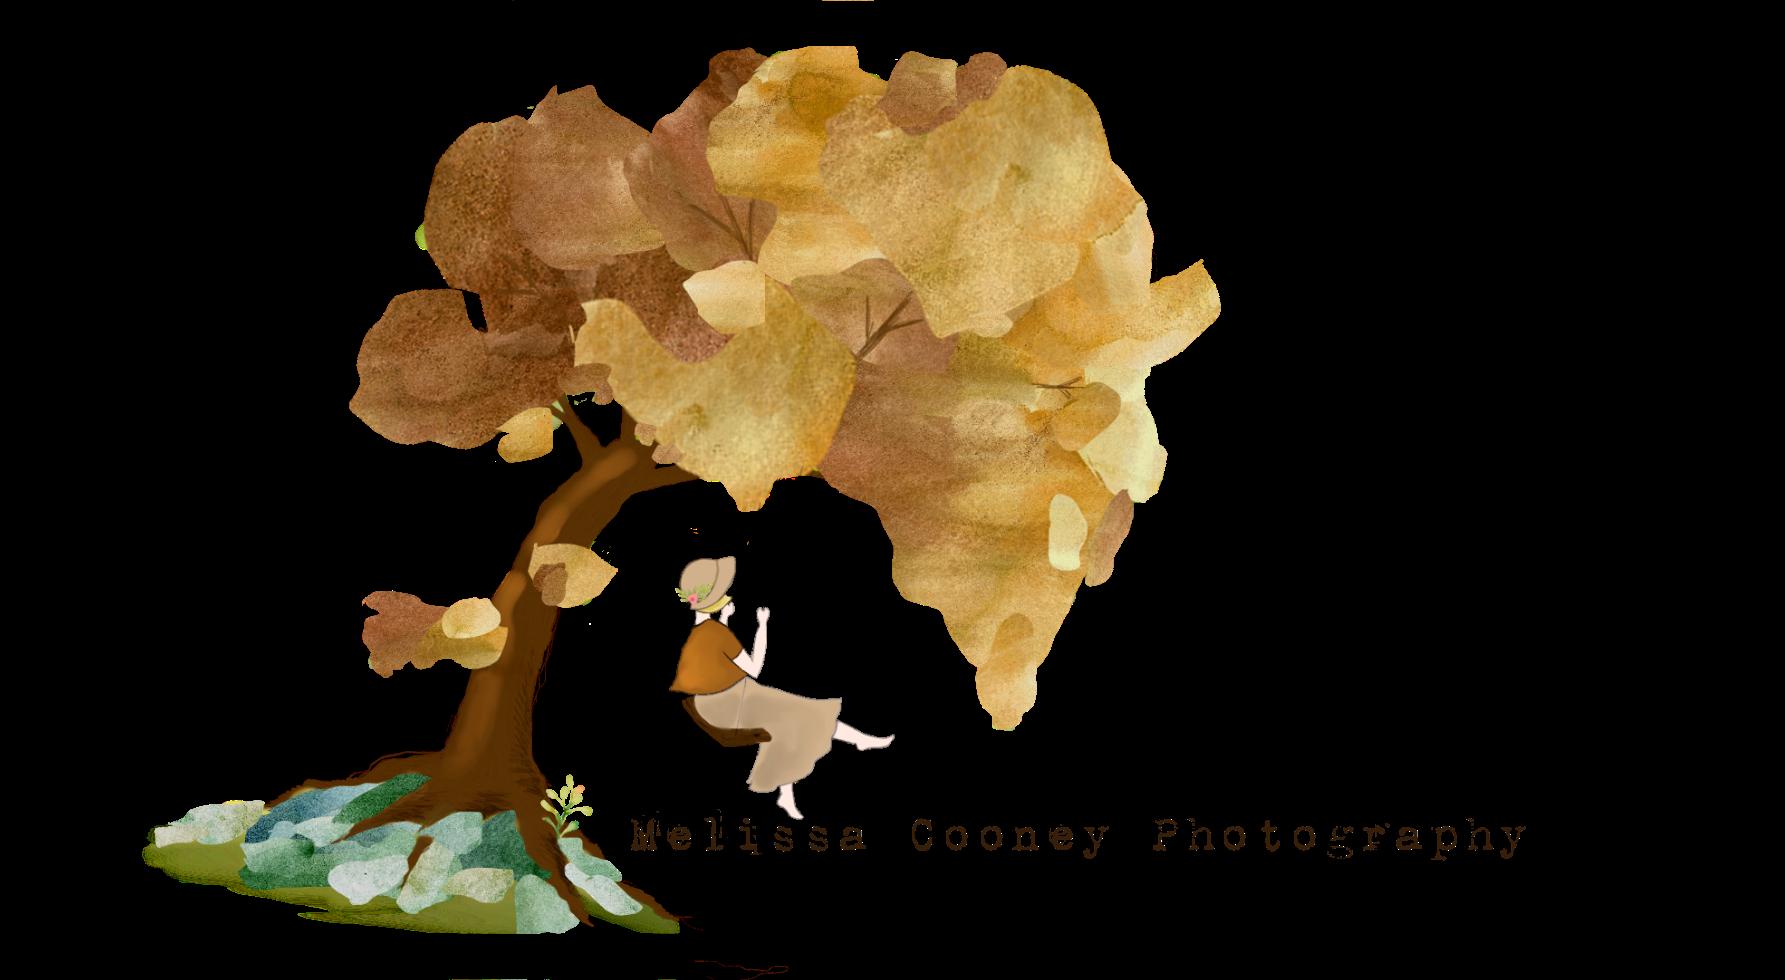 Melissa Cooney Photography